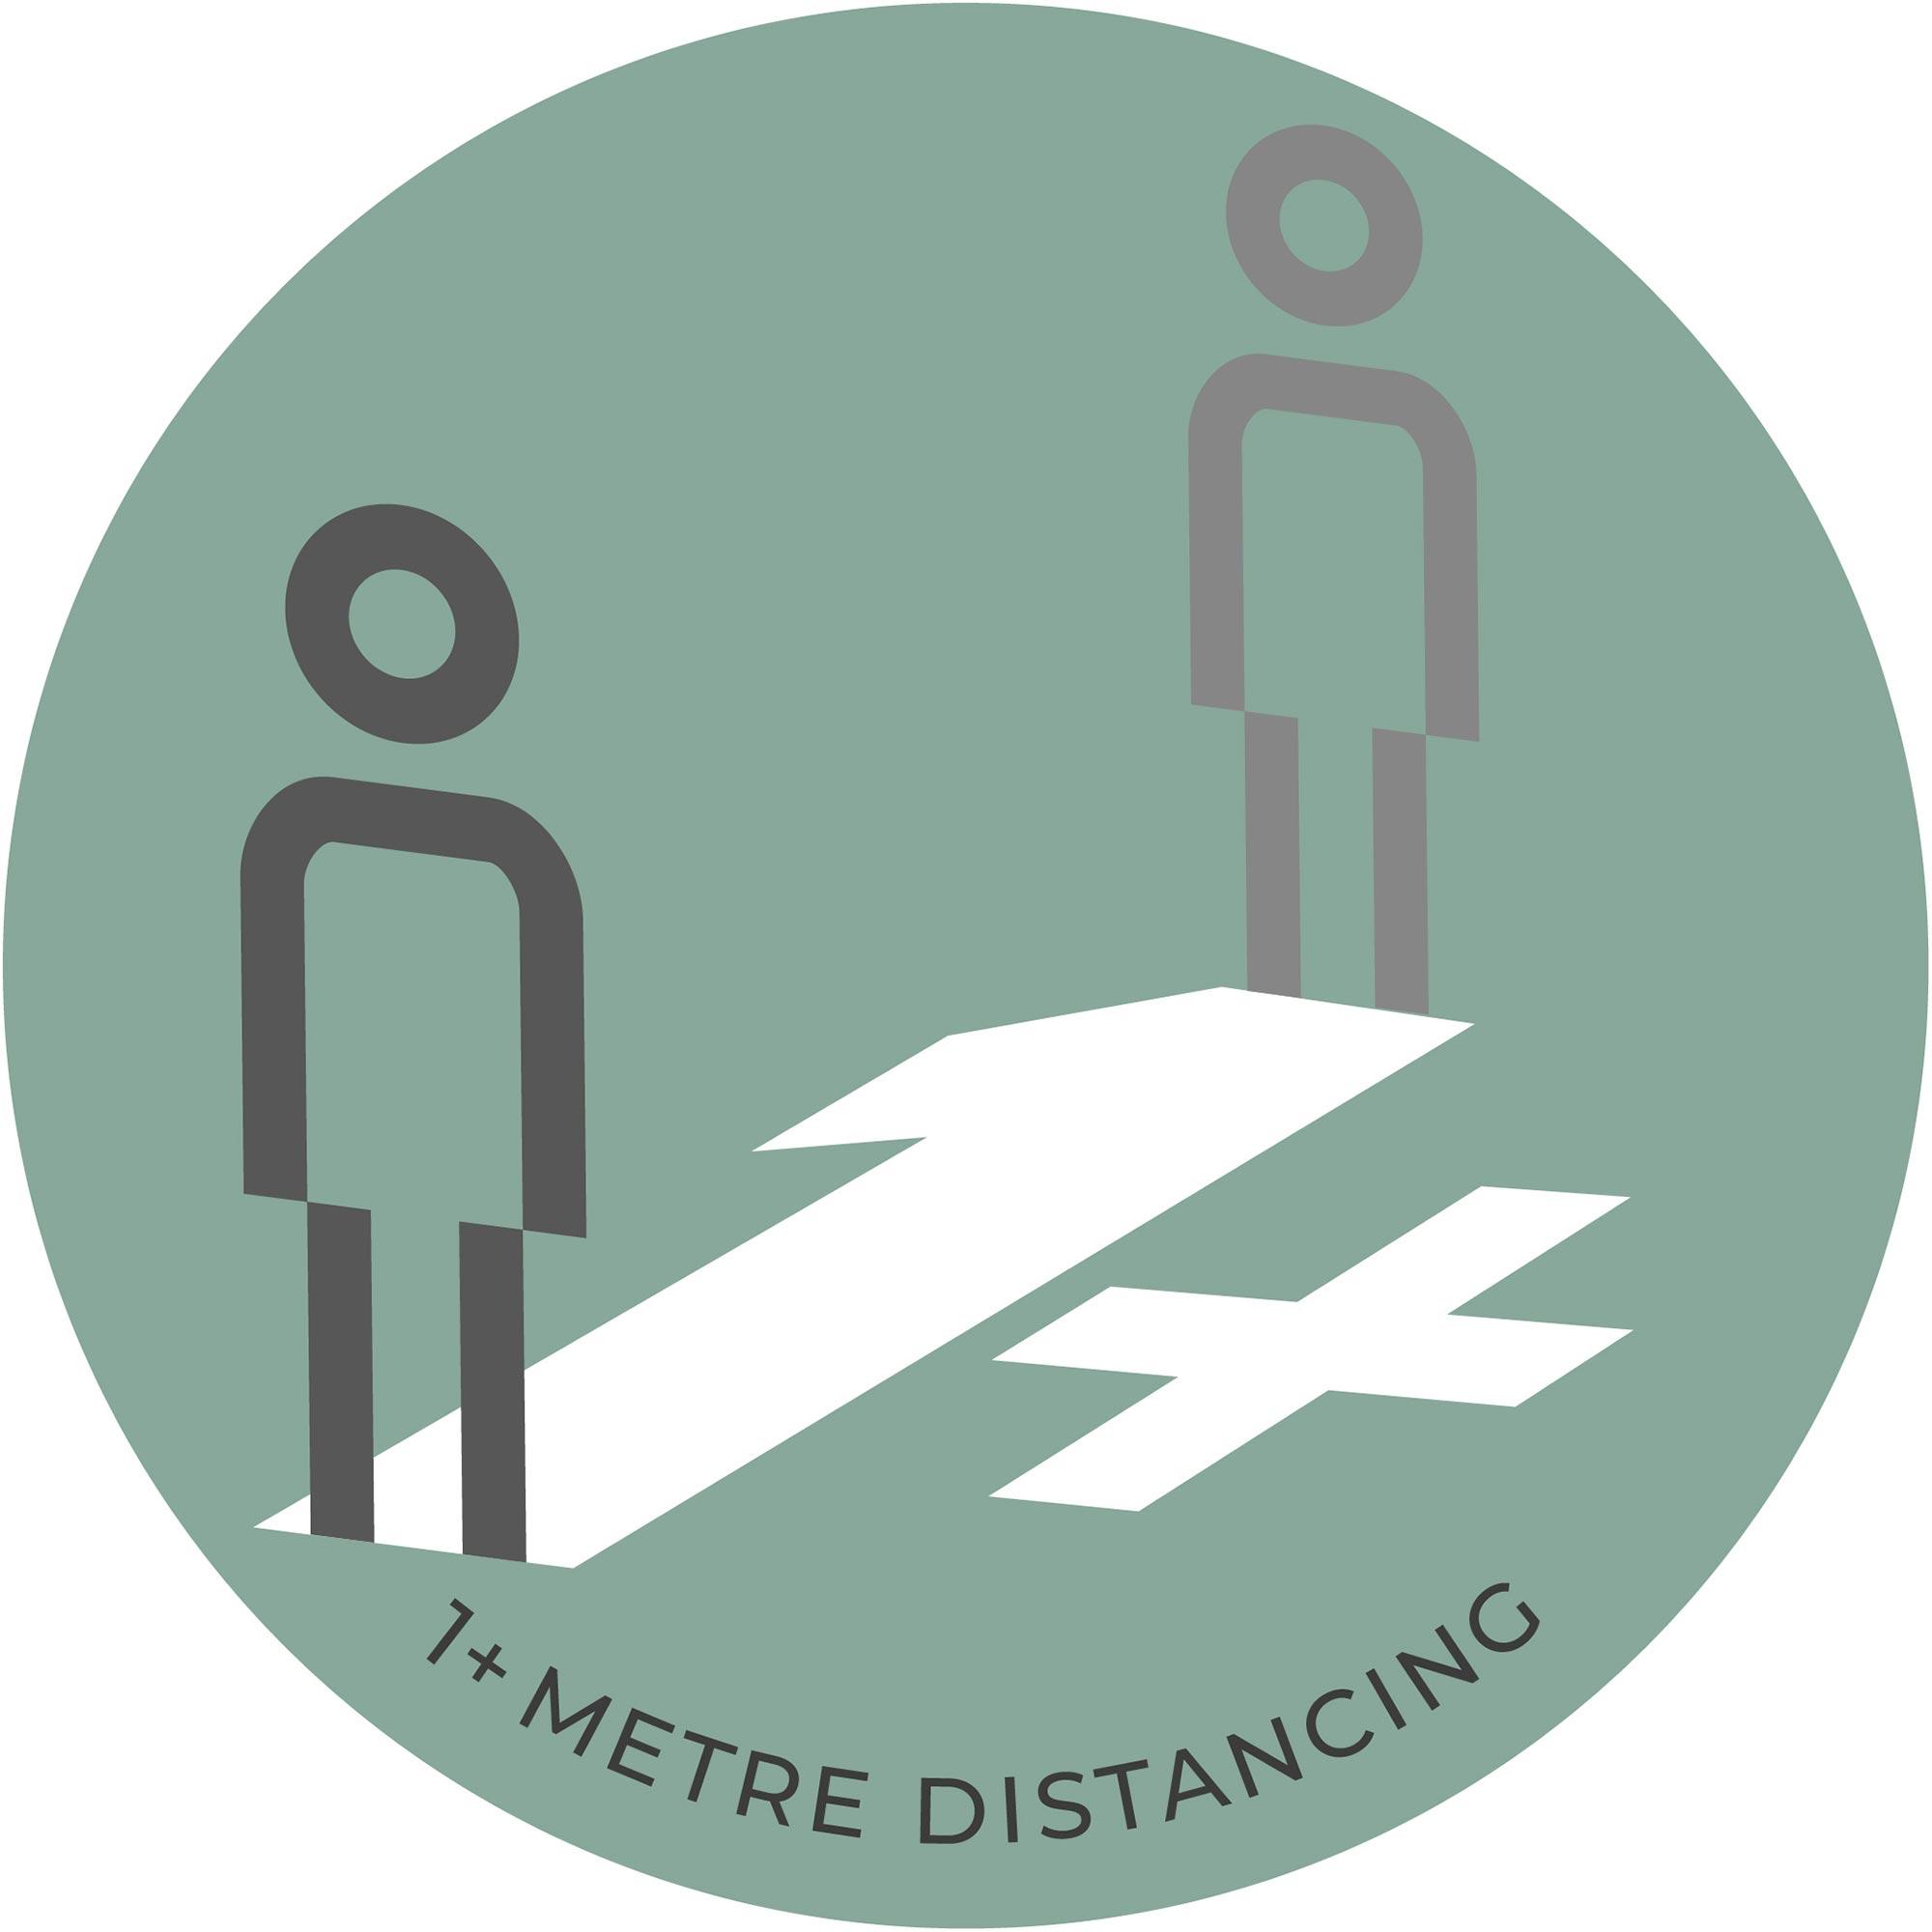 1 Metre Distancing - Teal Sticker